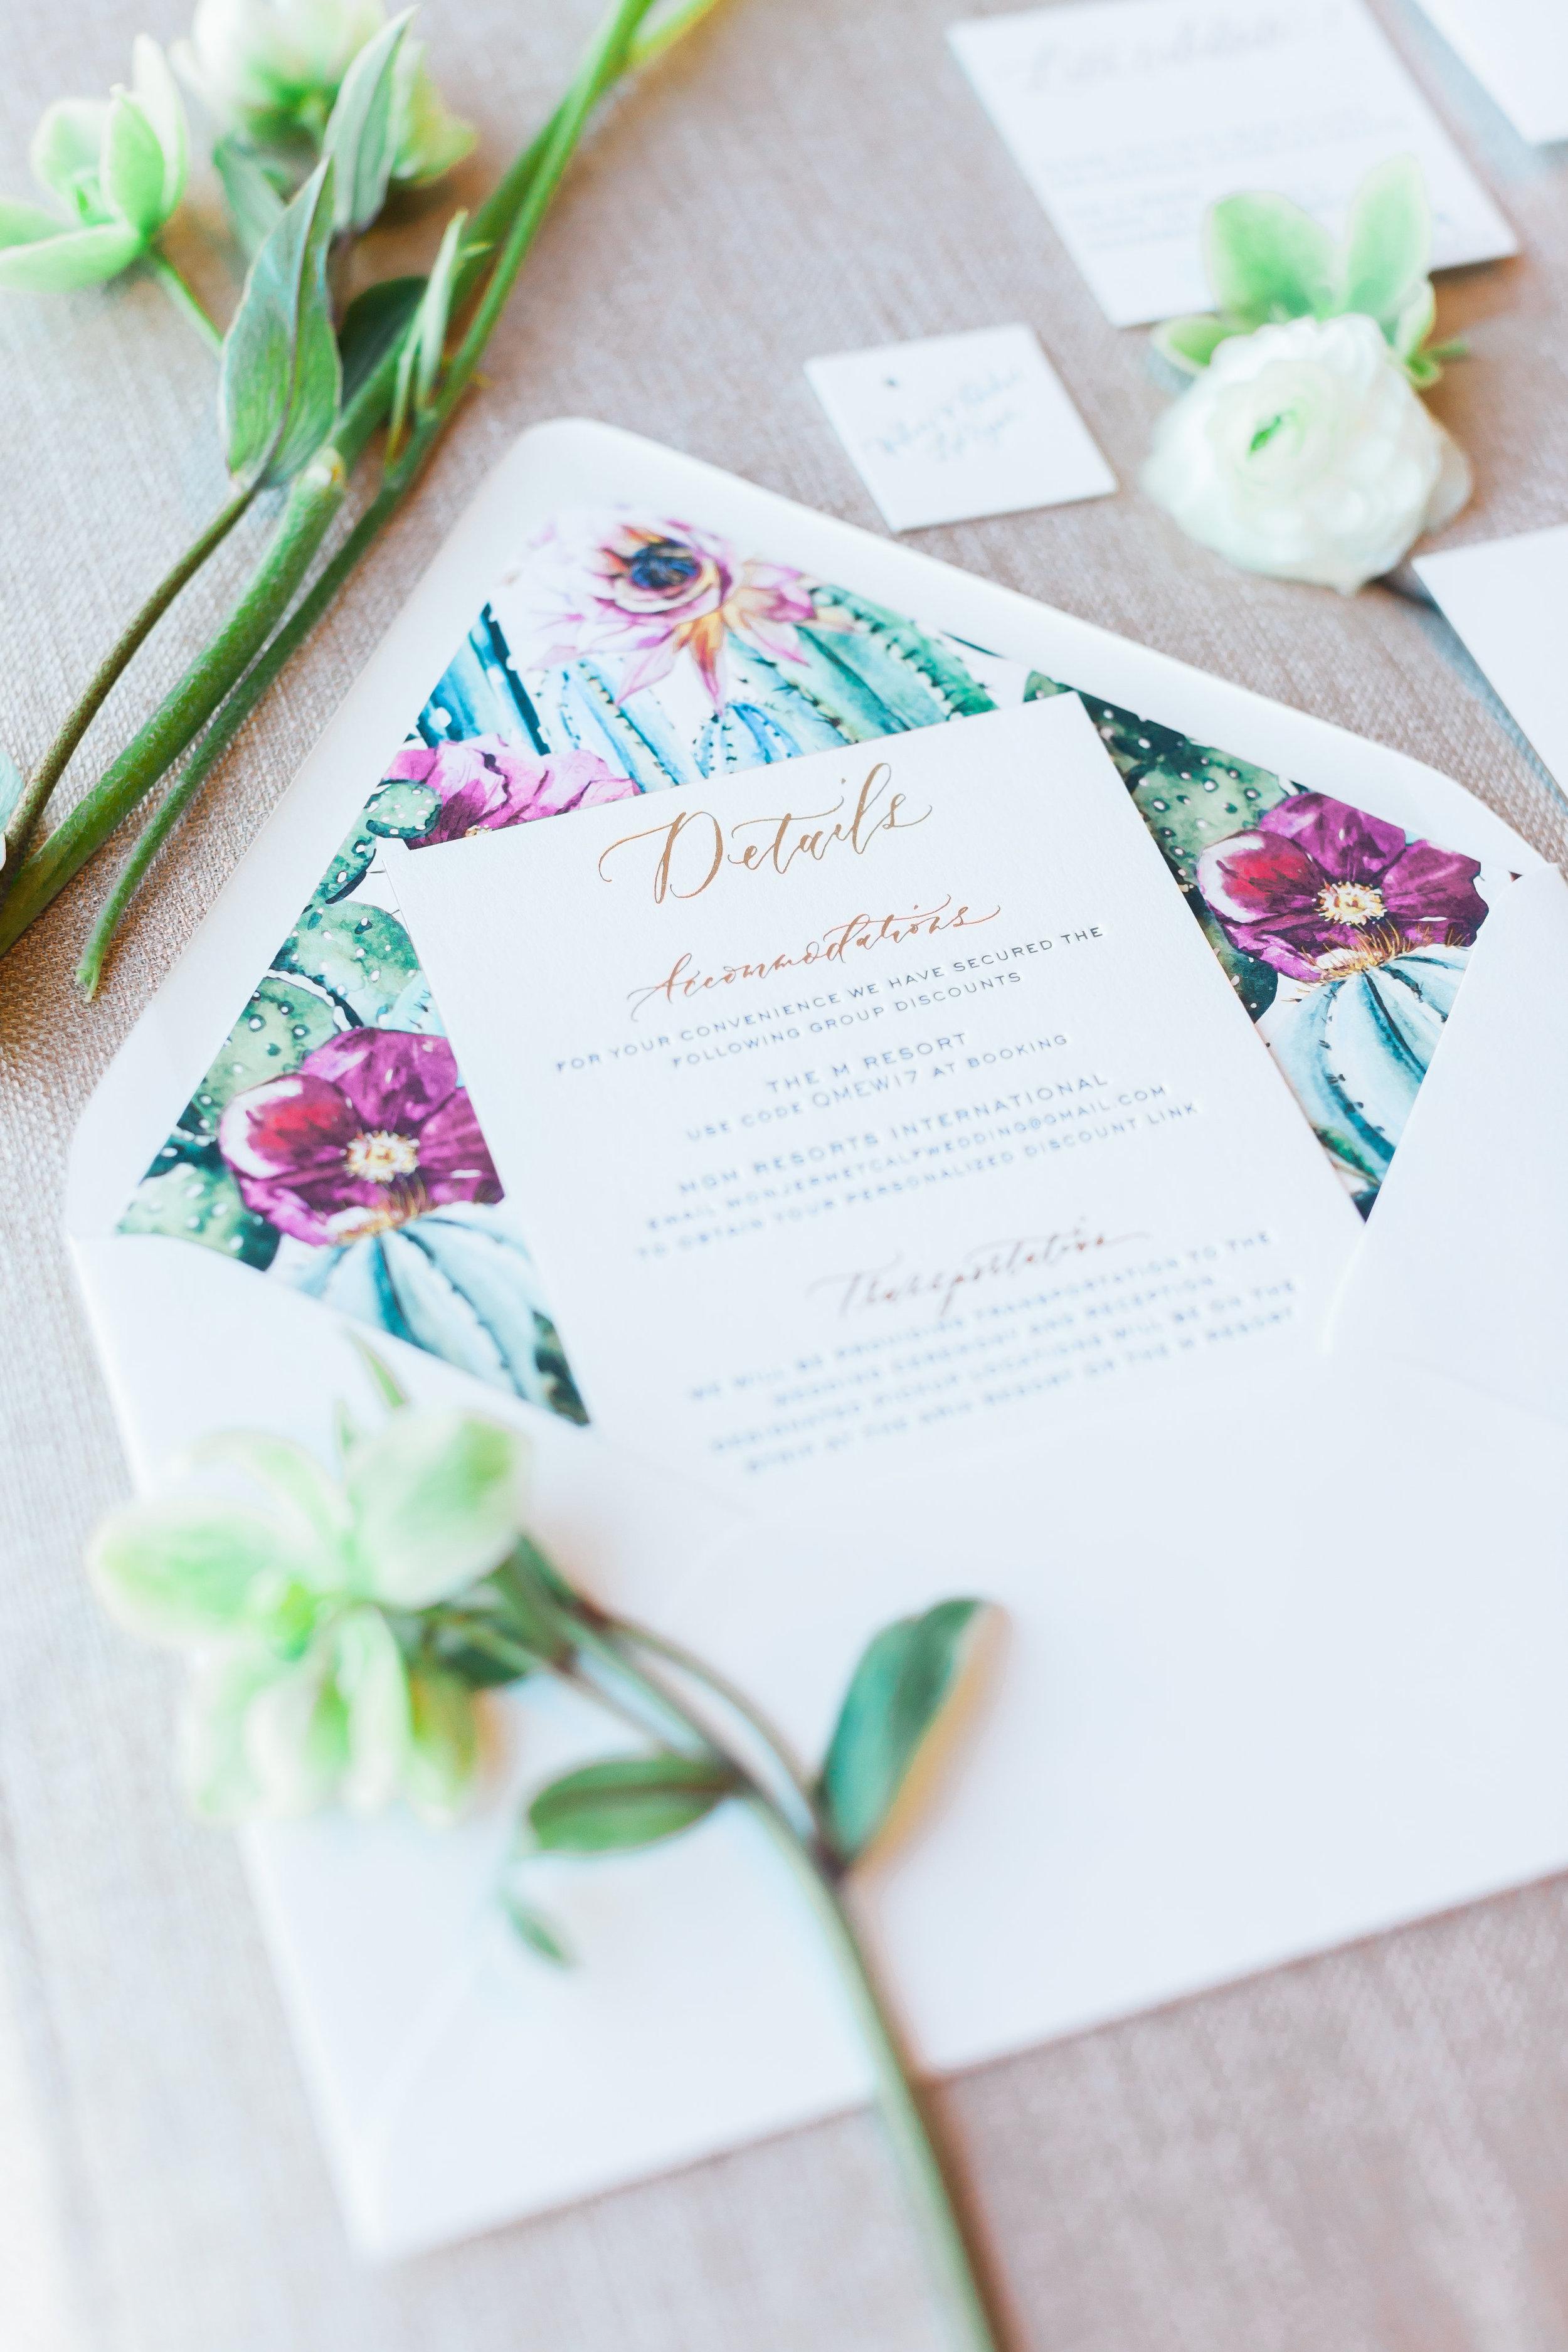 Beautiful invitation details